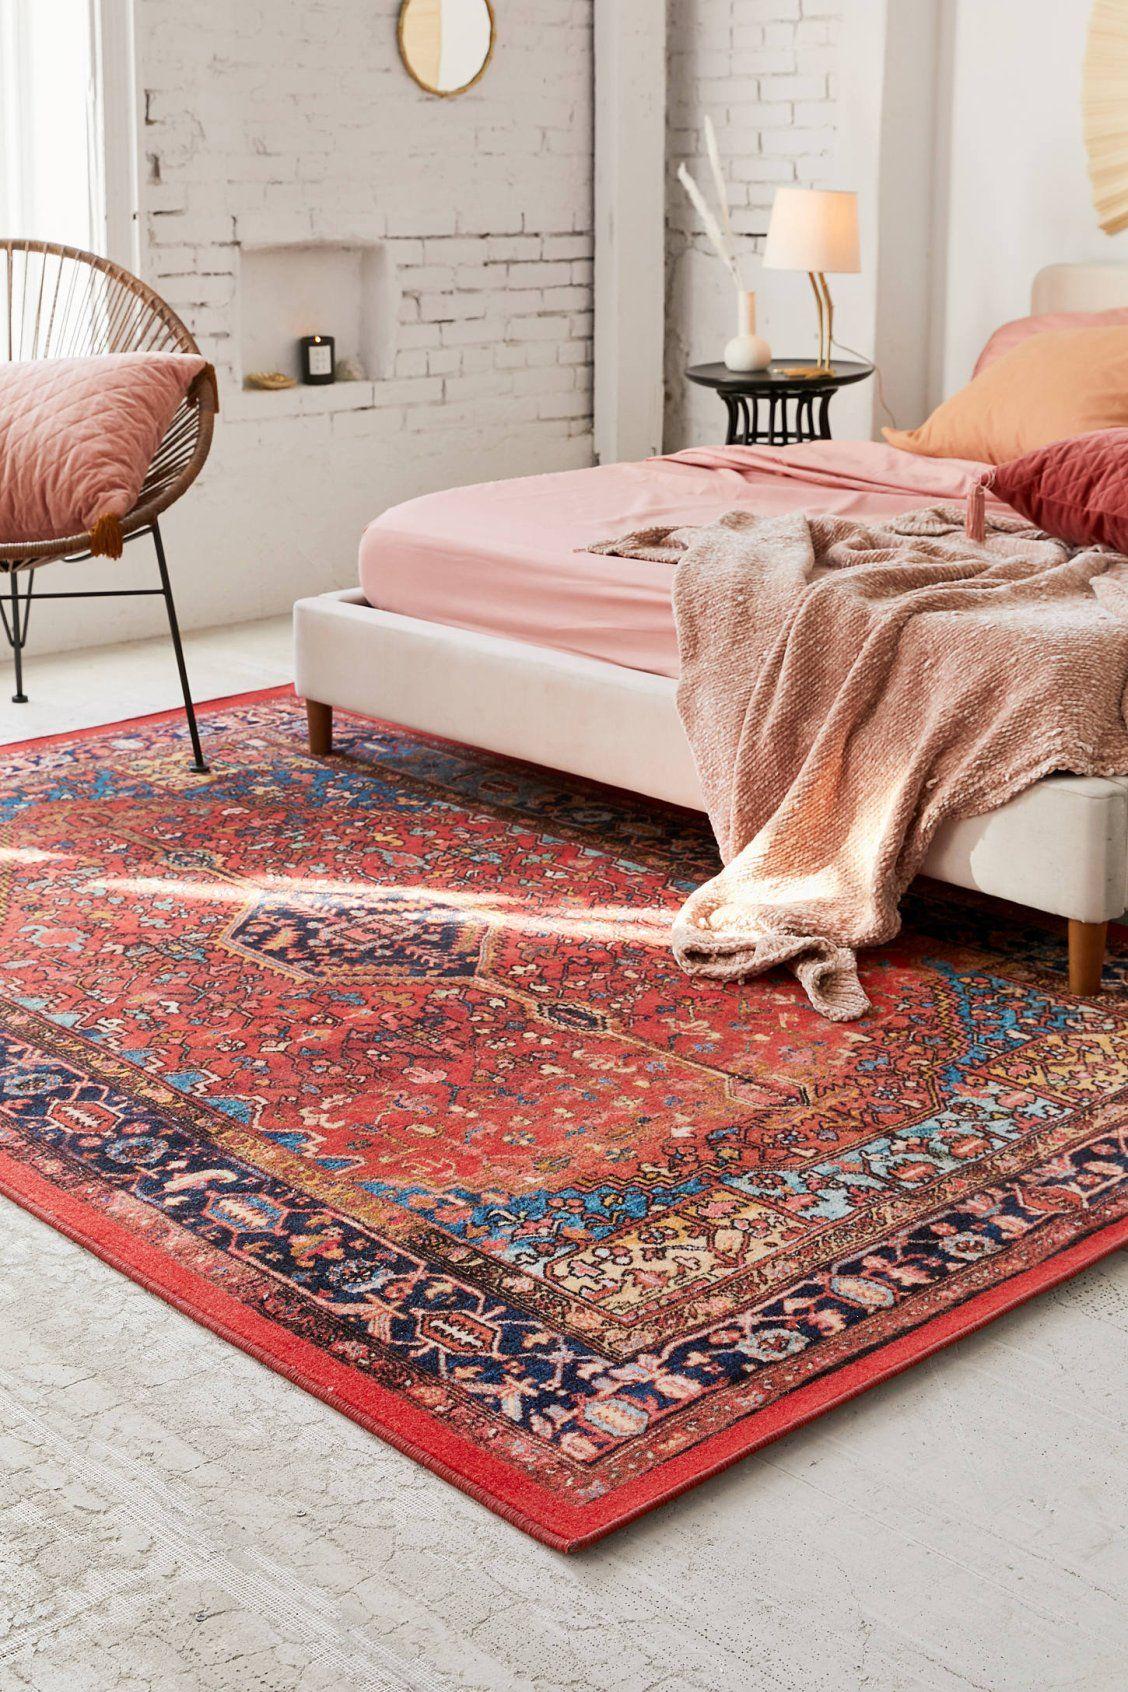 Classic Rug Pad | Bedroom | Rugs, Bedroom decor, Rugs on carpet